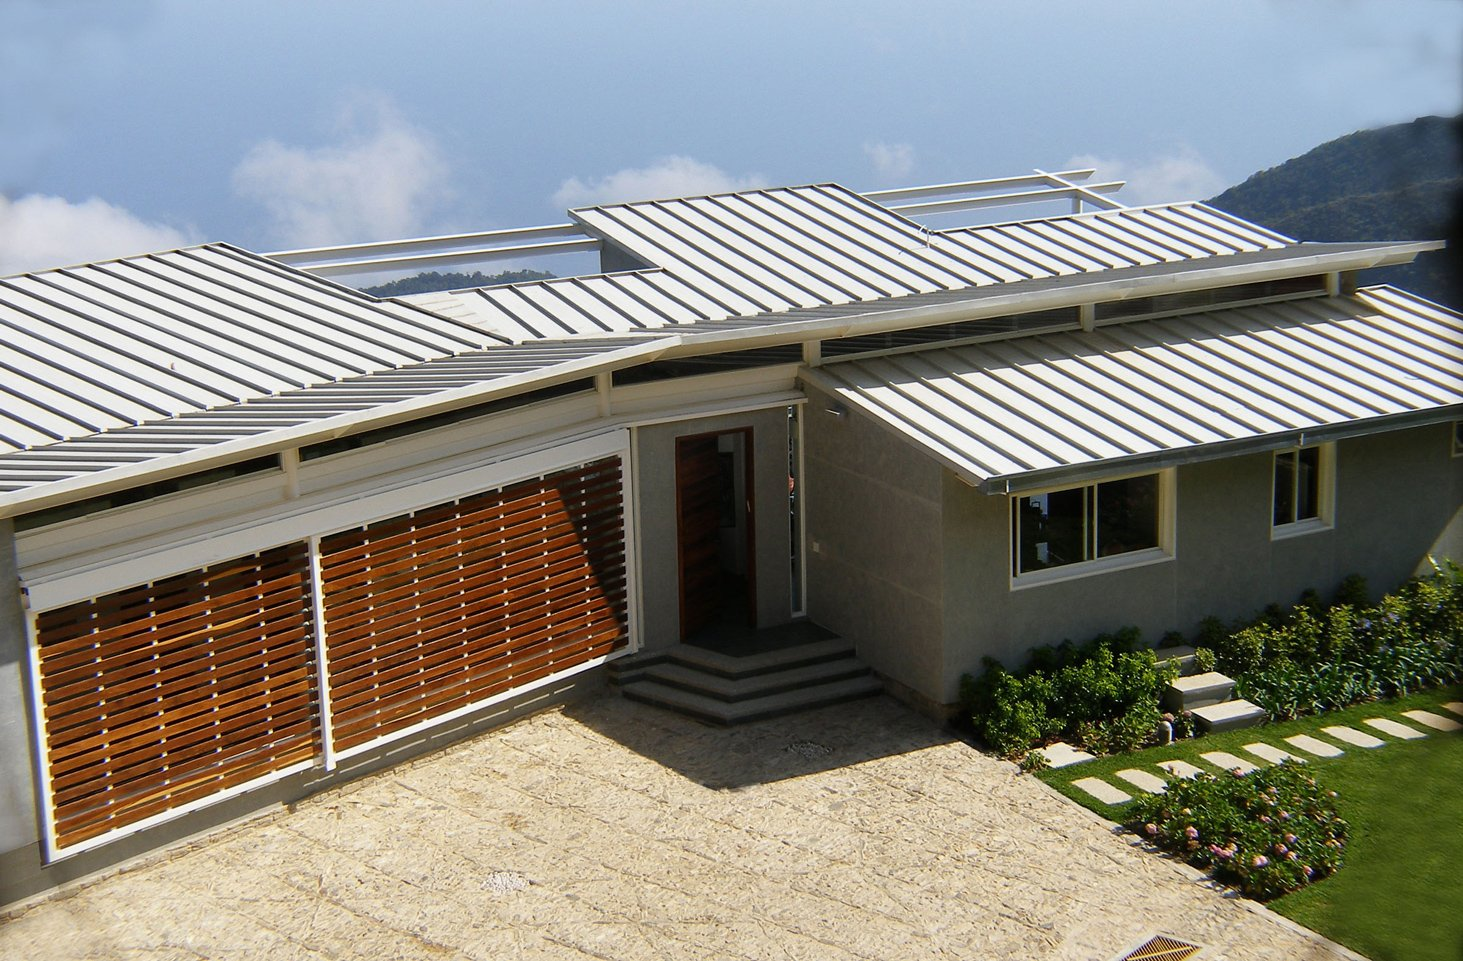 Exterior Architecture project in Galipan El Avila, Venezuela